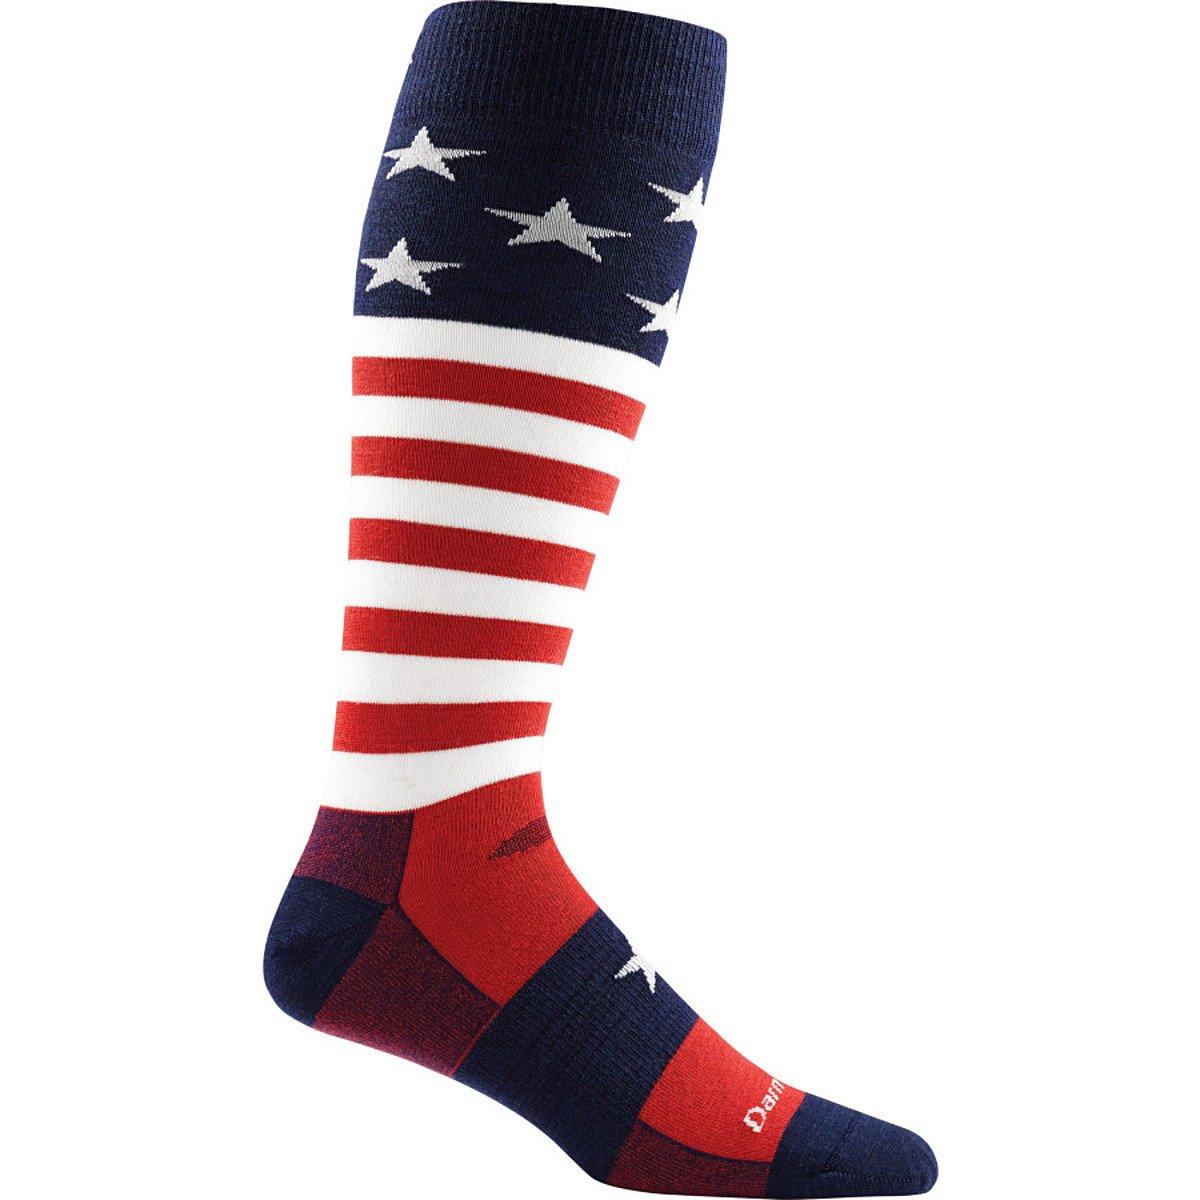 Amazon.com : Darn Tough Captain America Ultra Light Sock - Men's ...